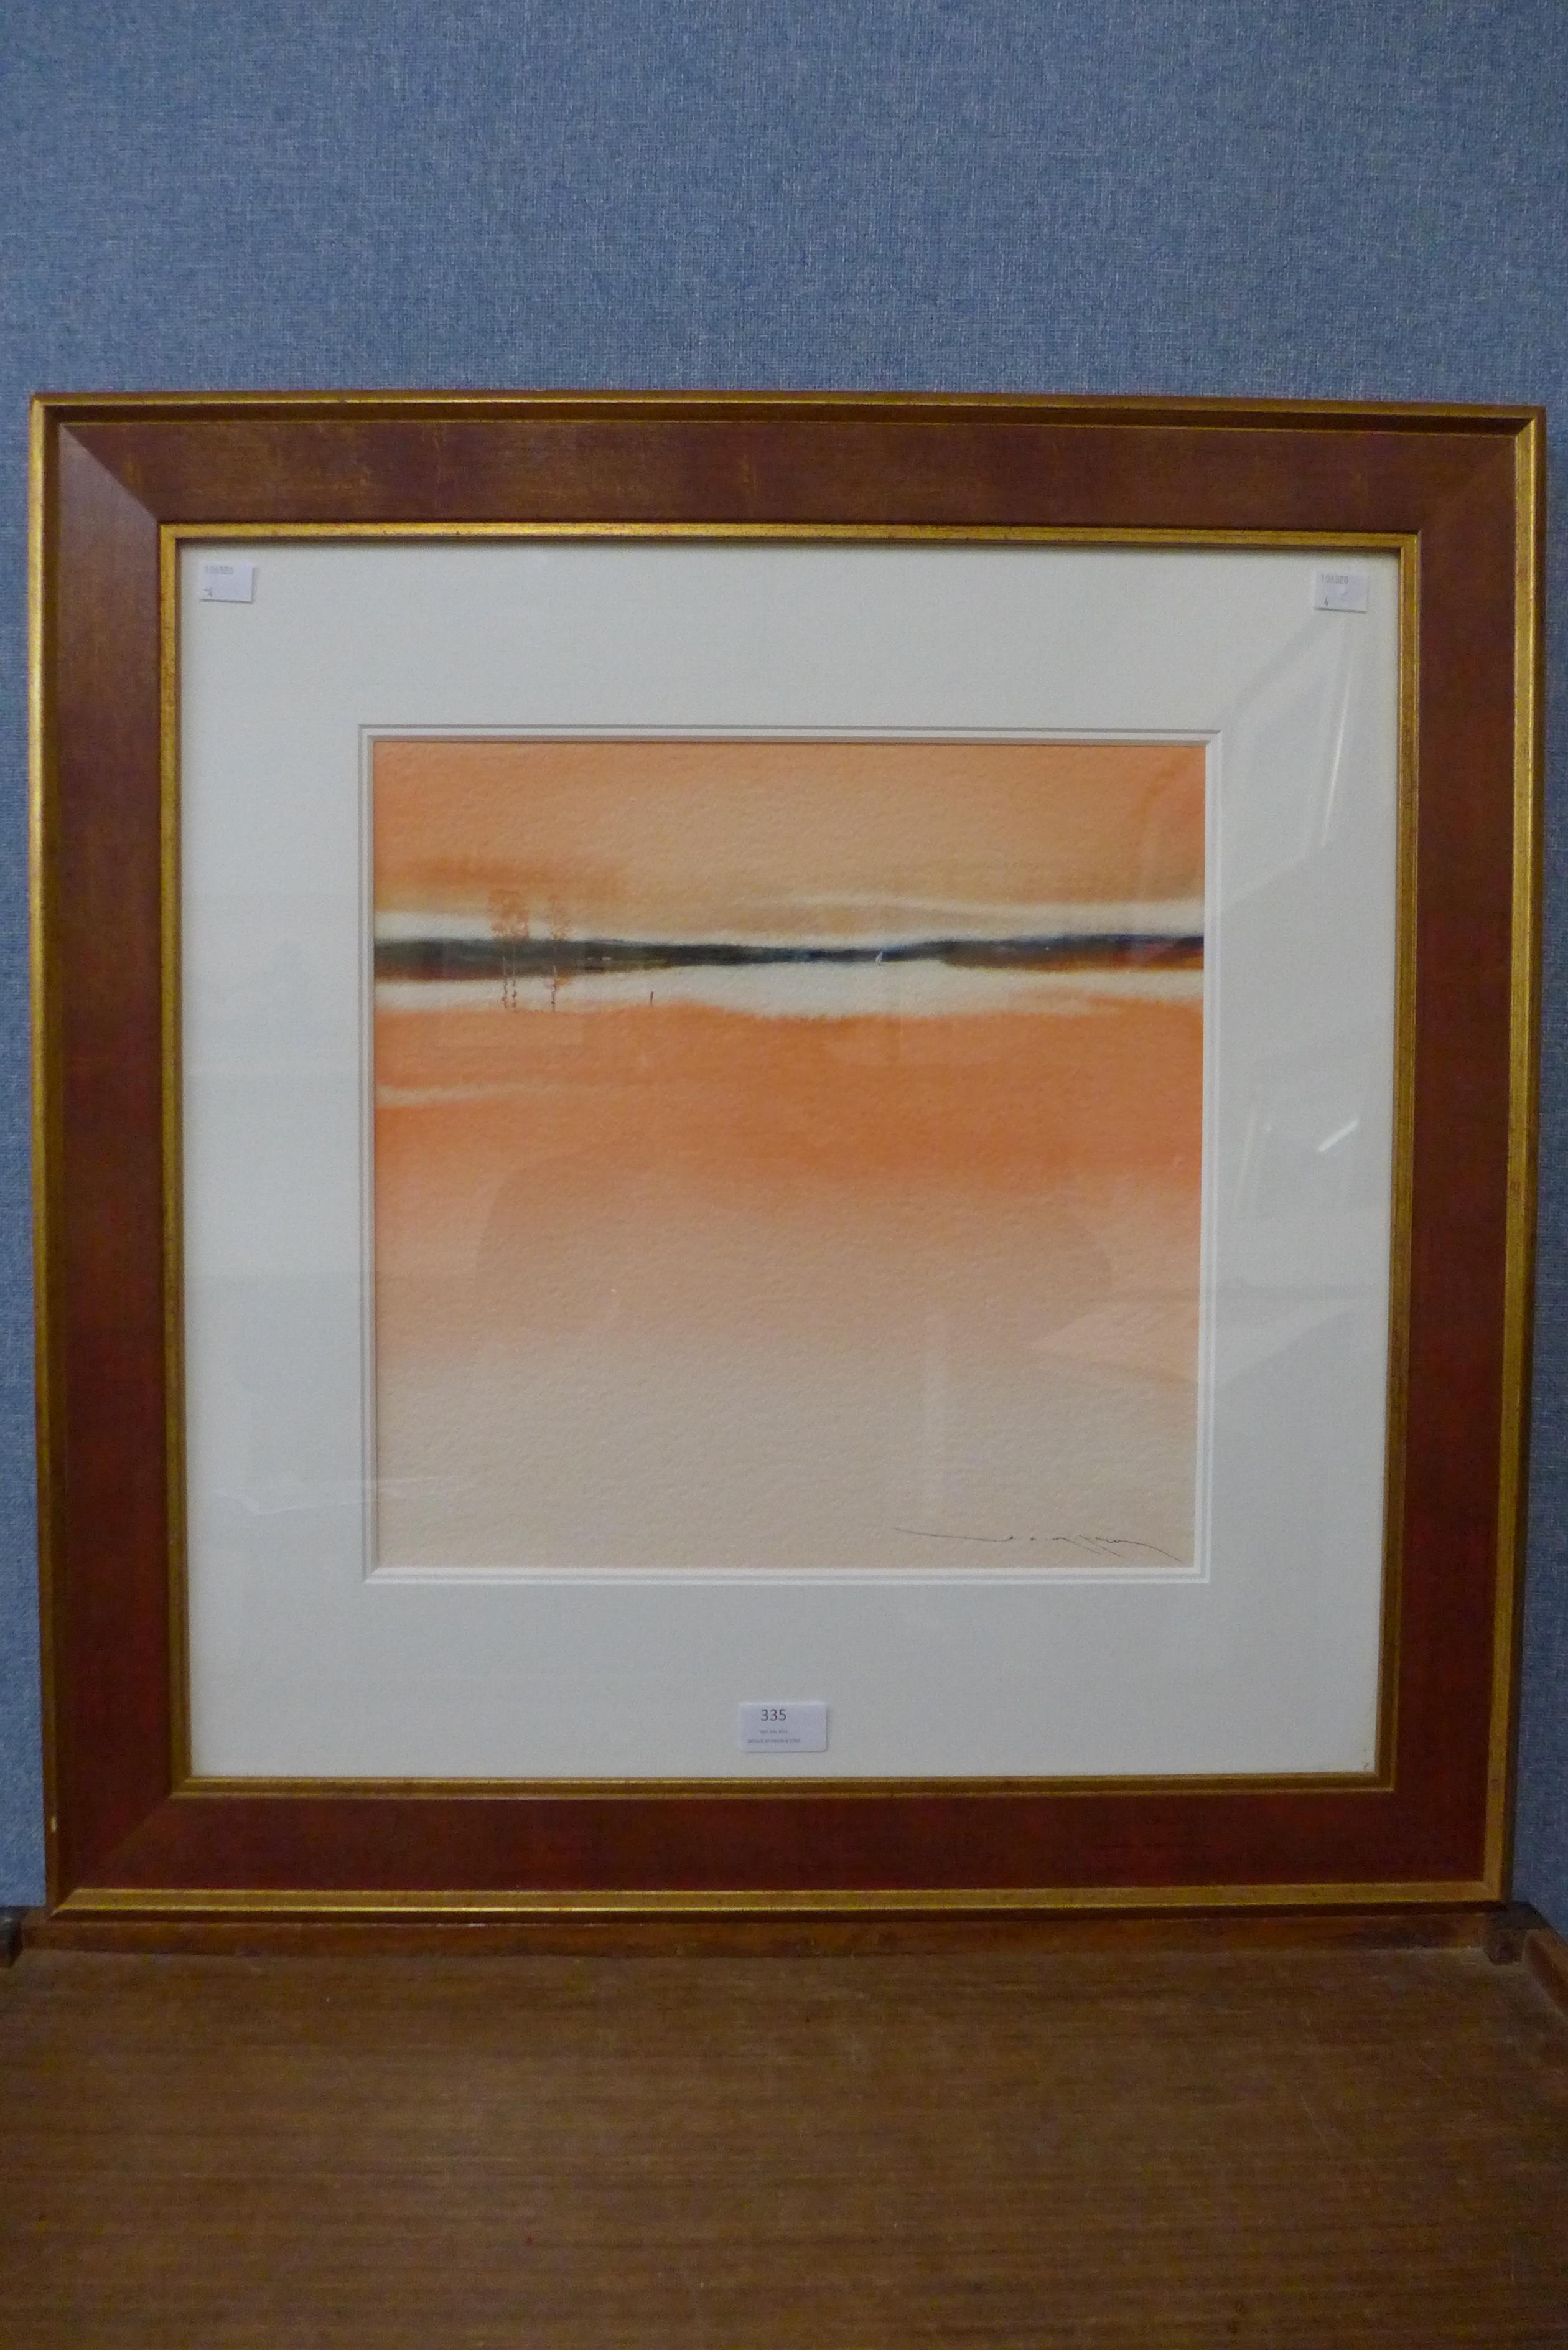 Simon King, English Skies IV, watercolour, framed